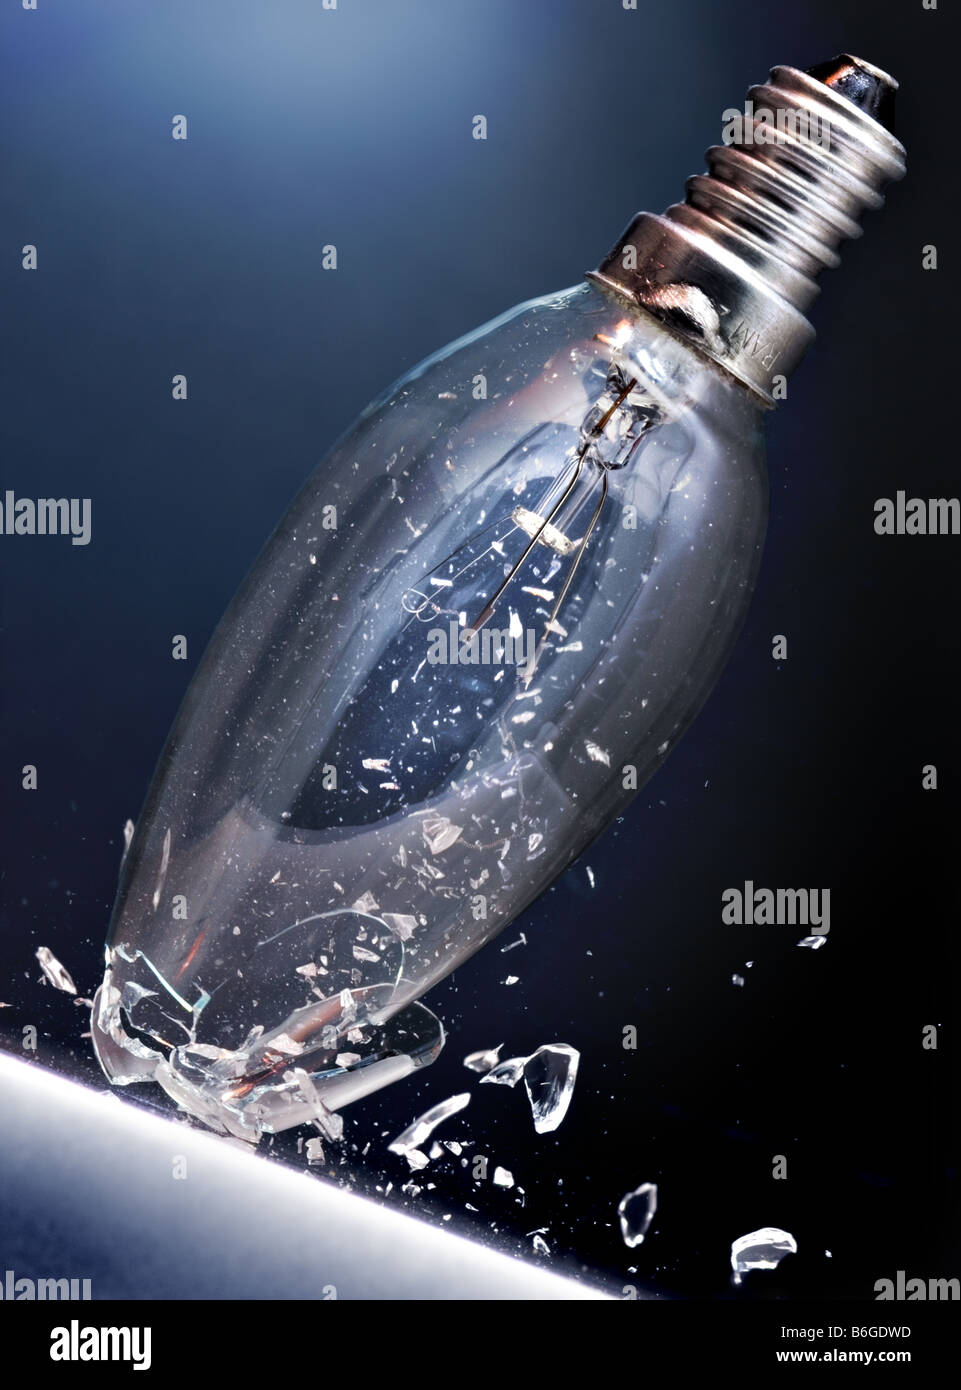 Light bulb hits marble floor - Stock Image